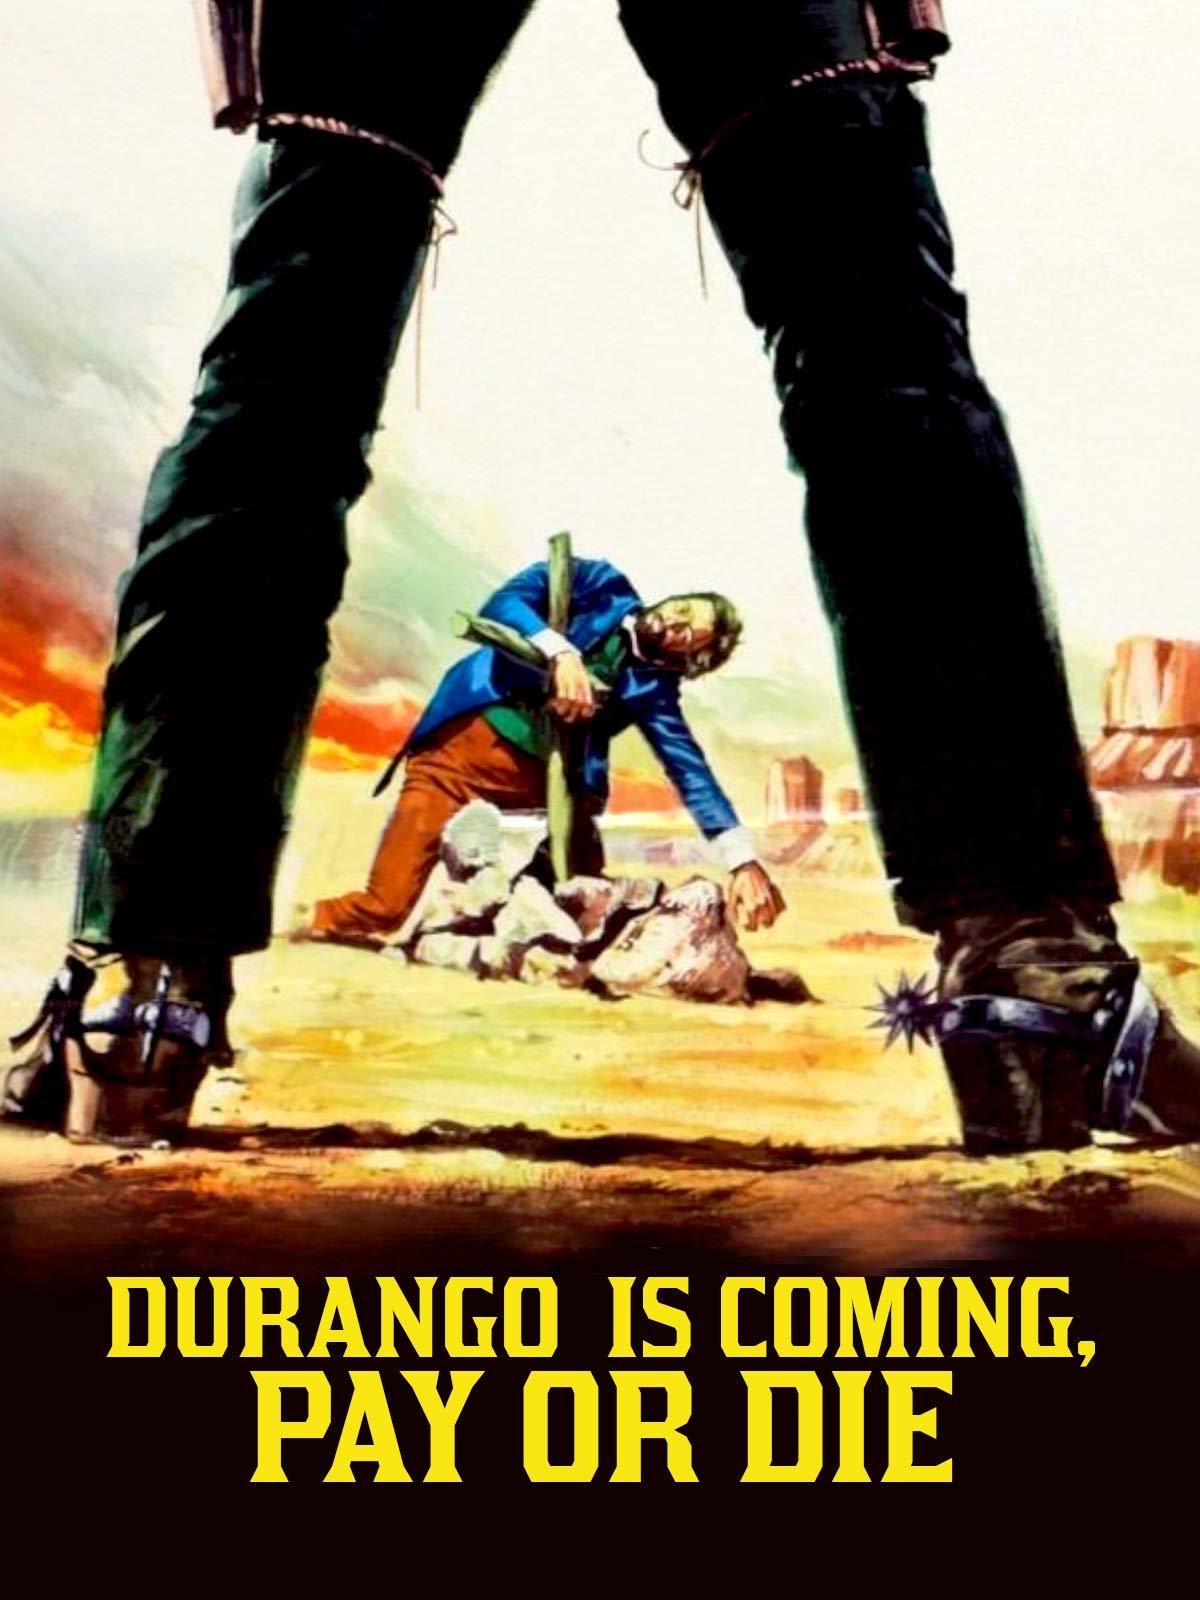 Durango Is Coming, Pay or Die